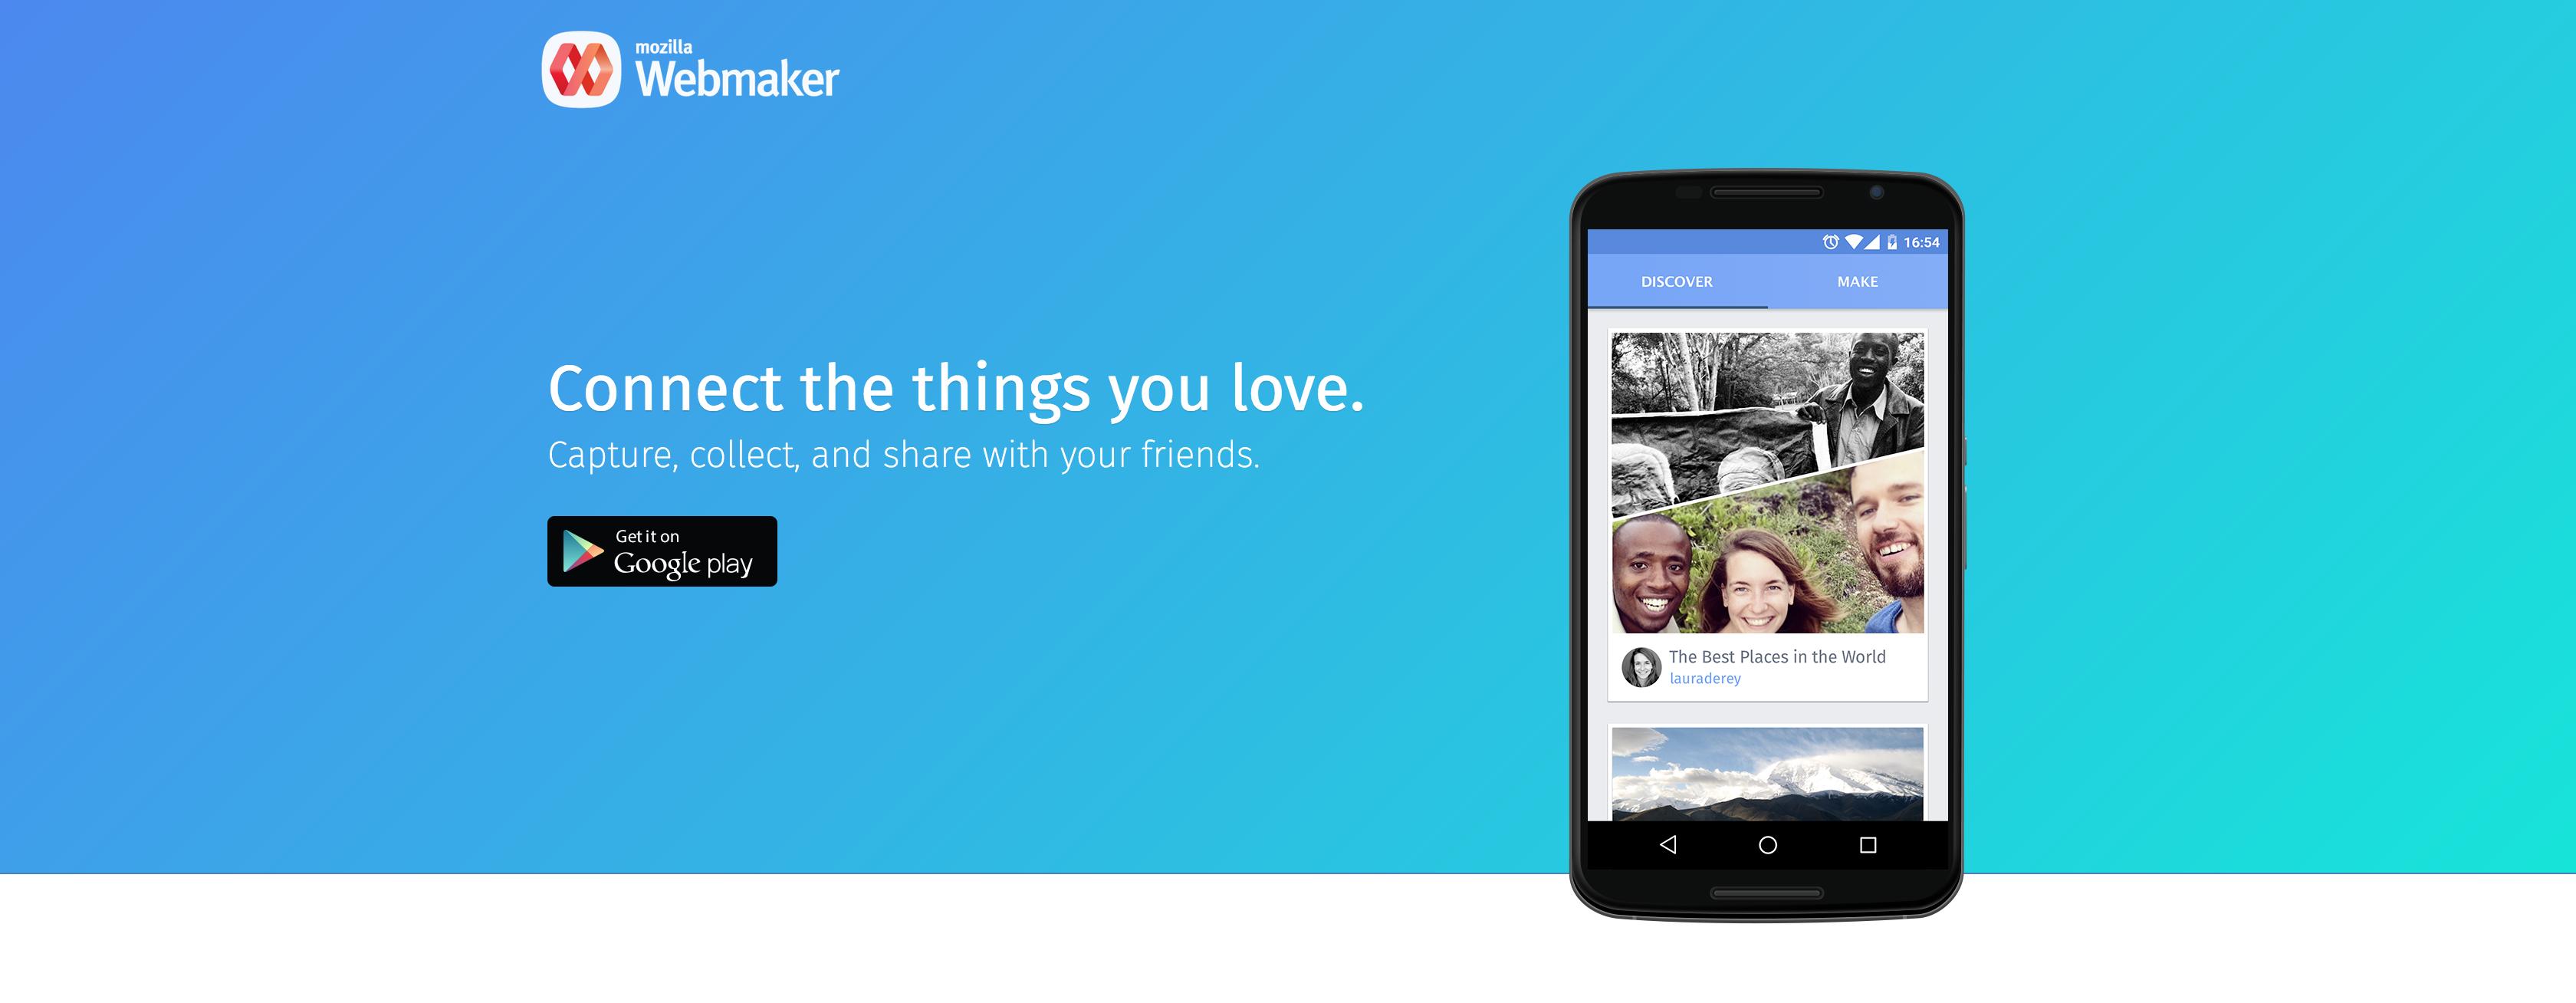 Webmaker homepage screenshot